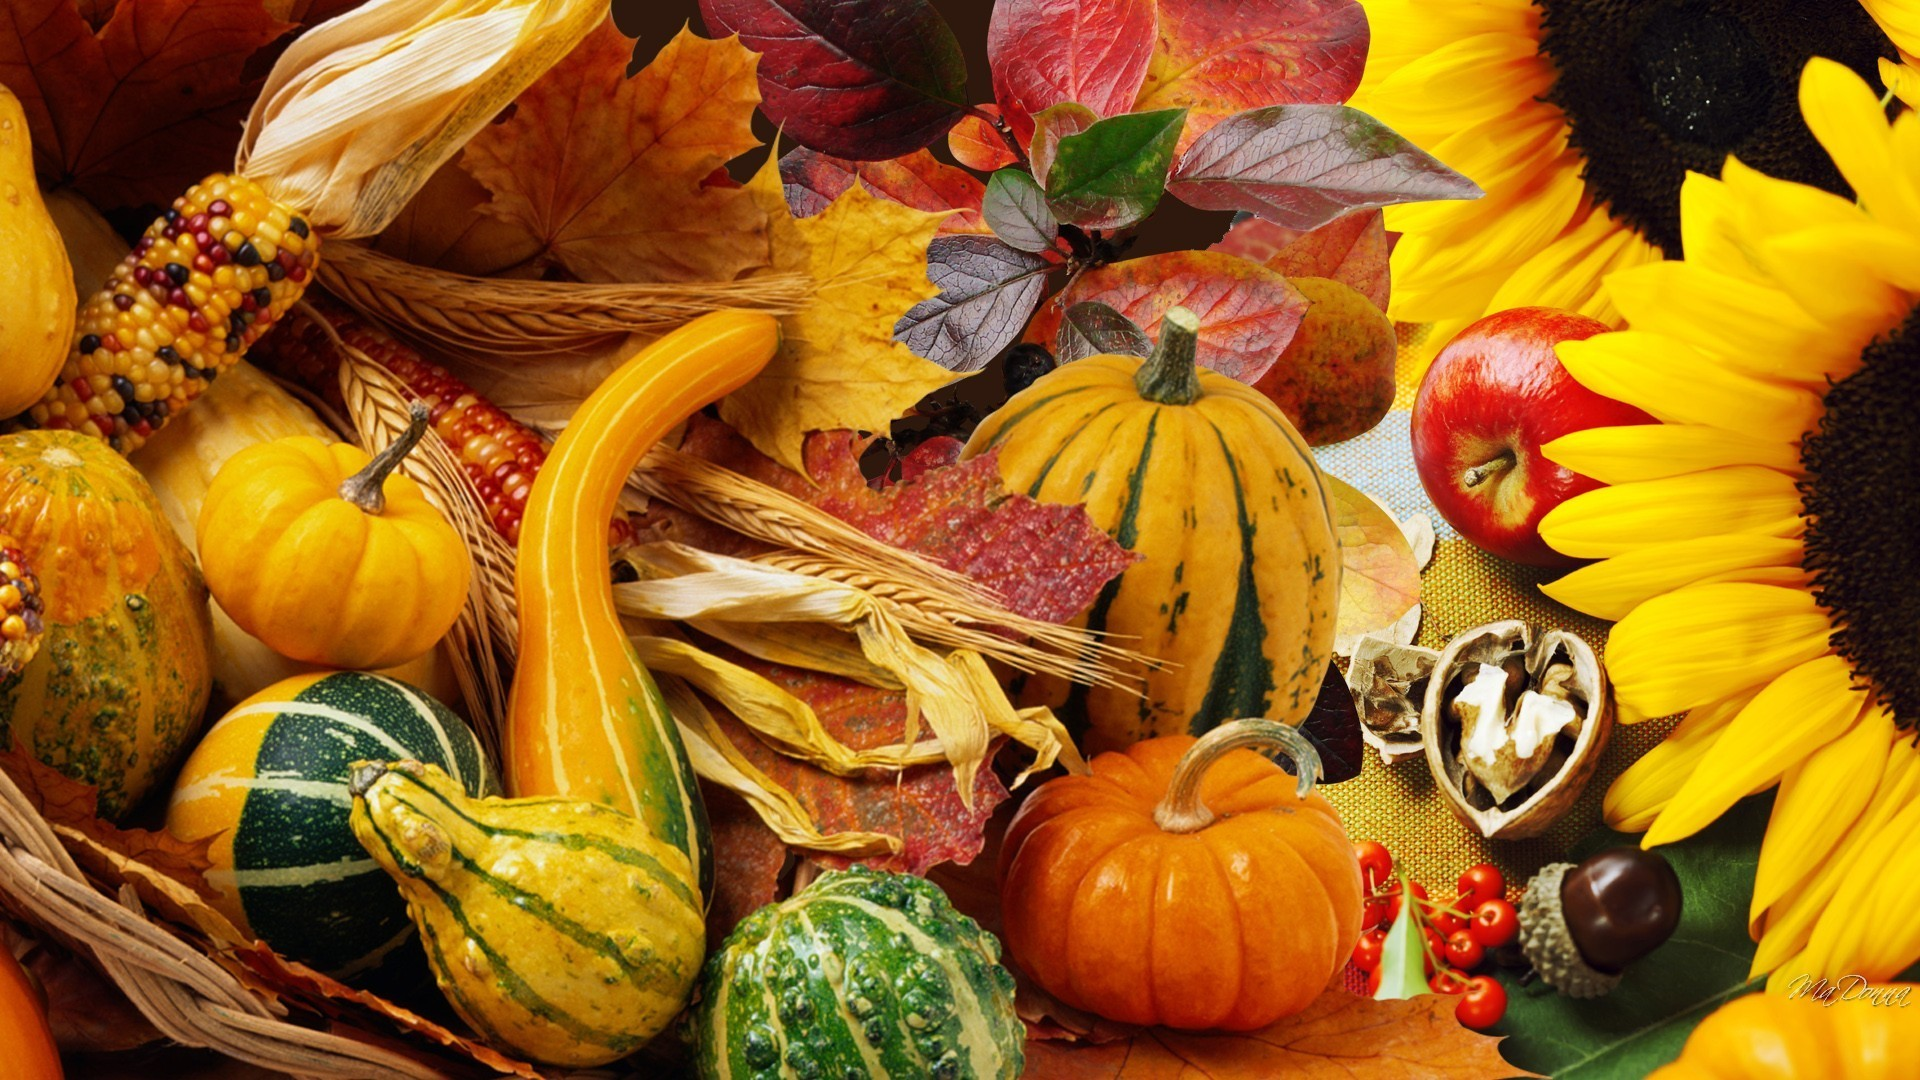 Thanksgiving Tag – Autumn Vegetables Fall Pumpkin Nuts Leaves Garden Apples  Harvest Squash Sunflowers Acorns Gourds